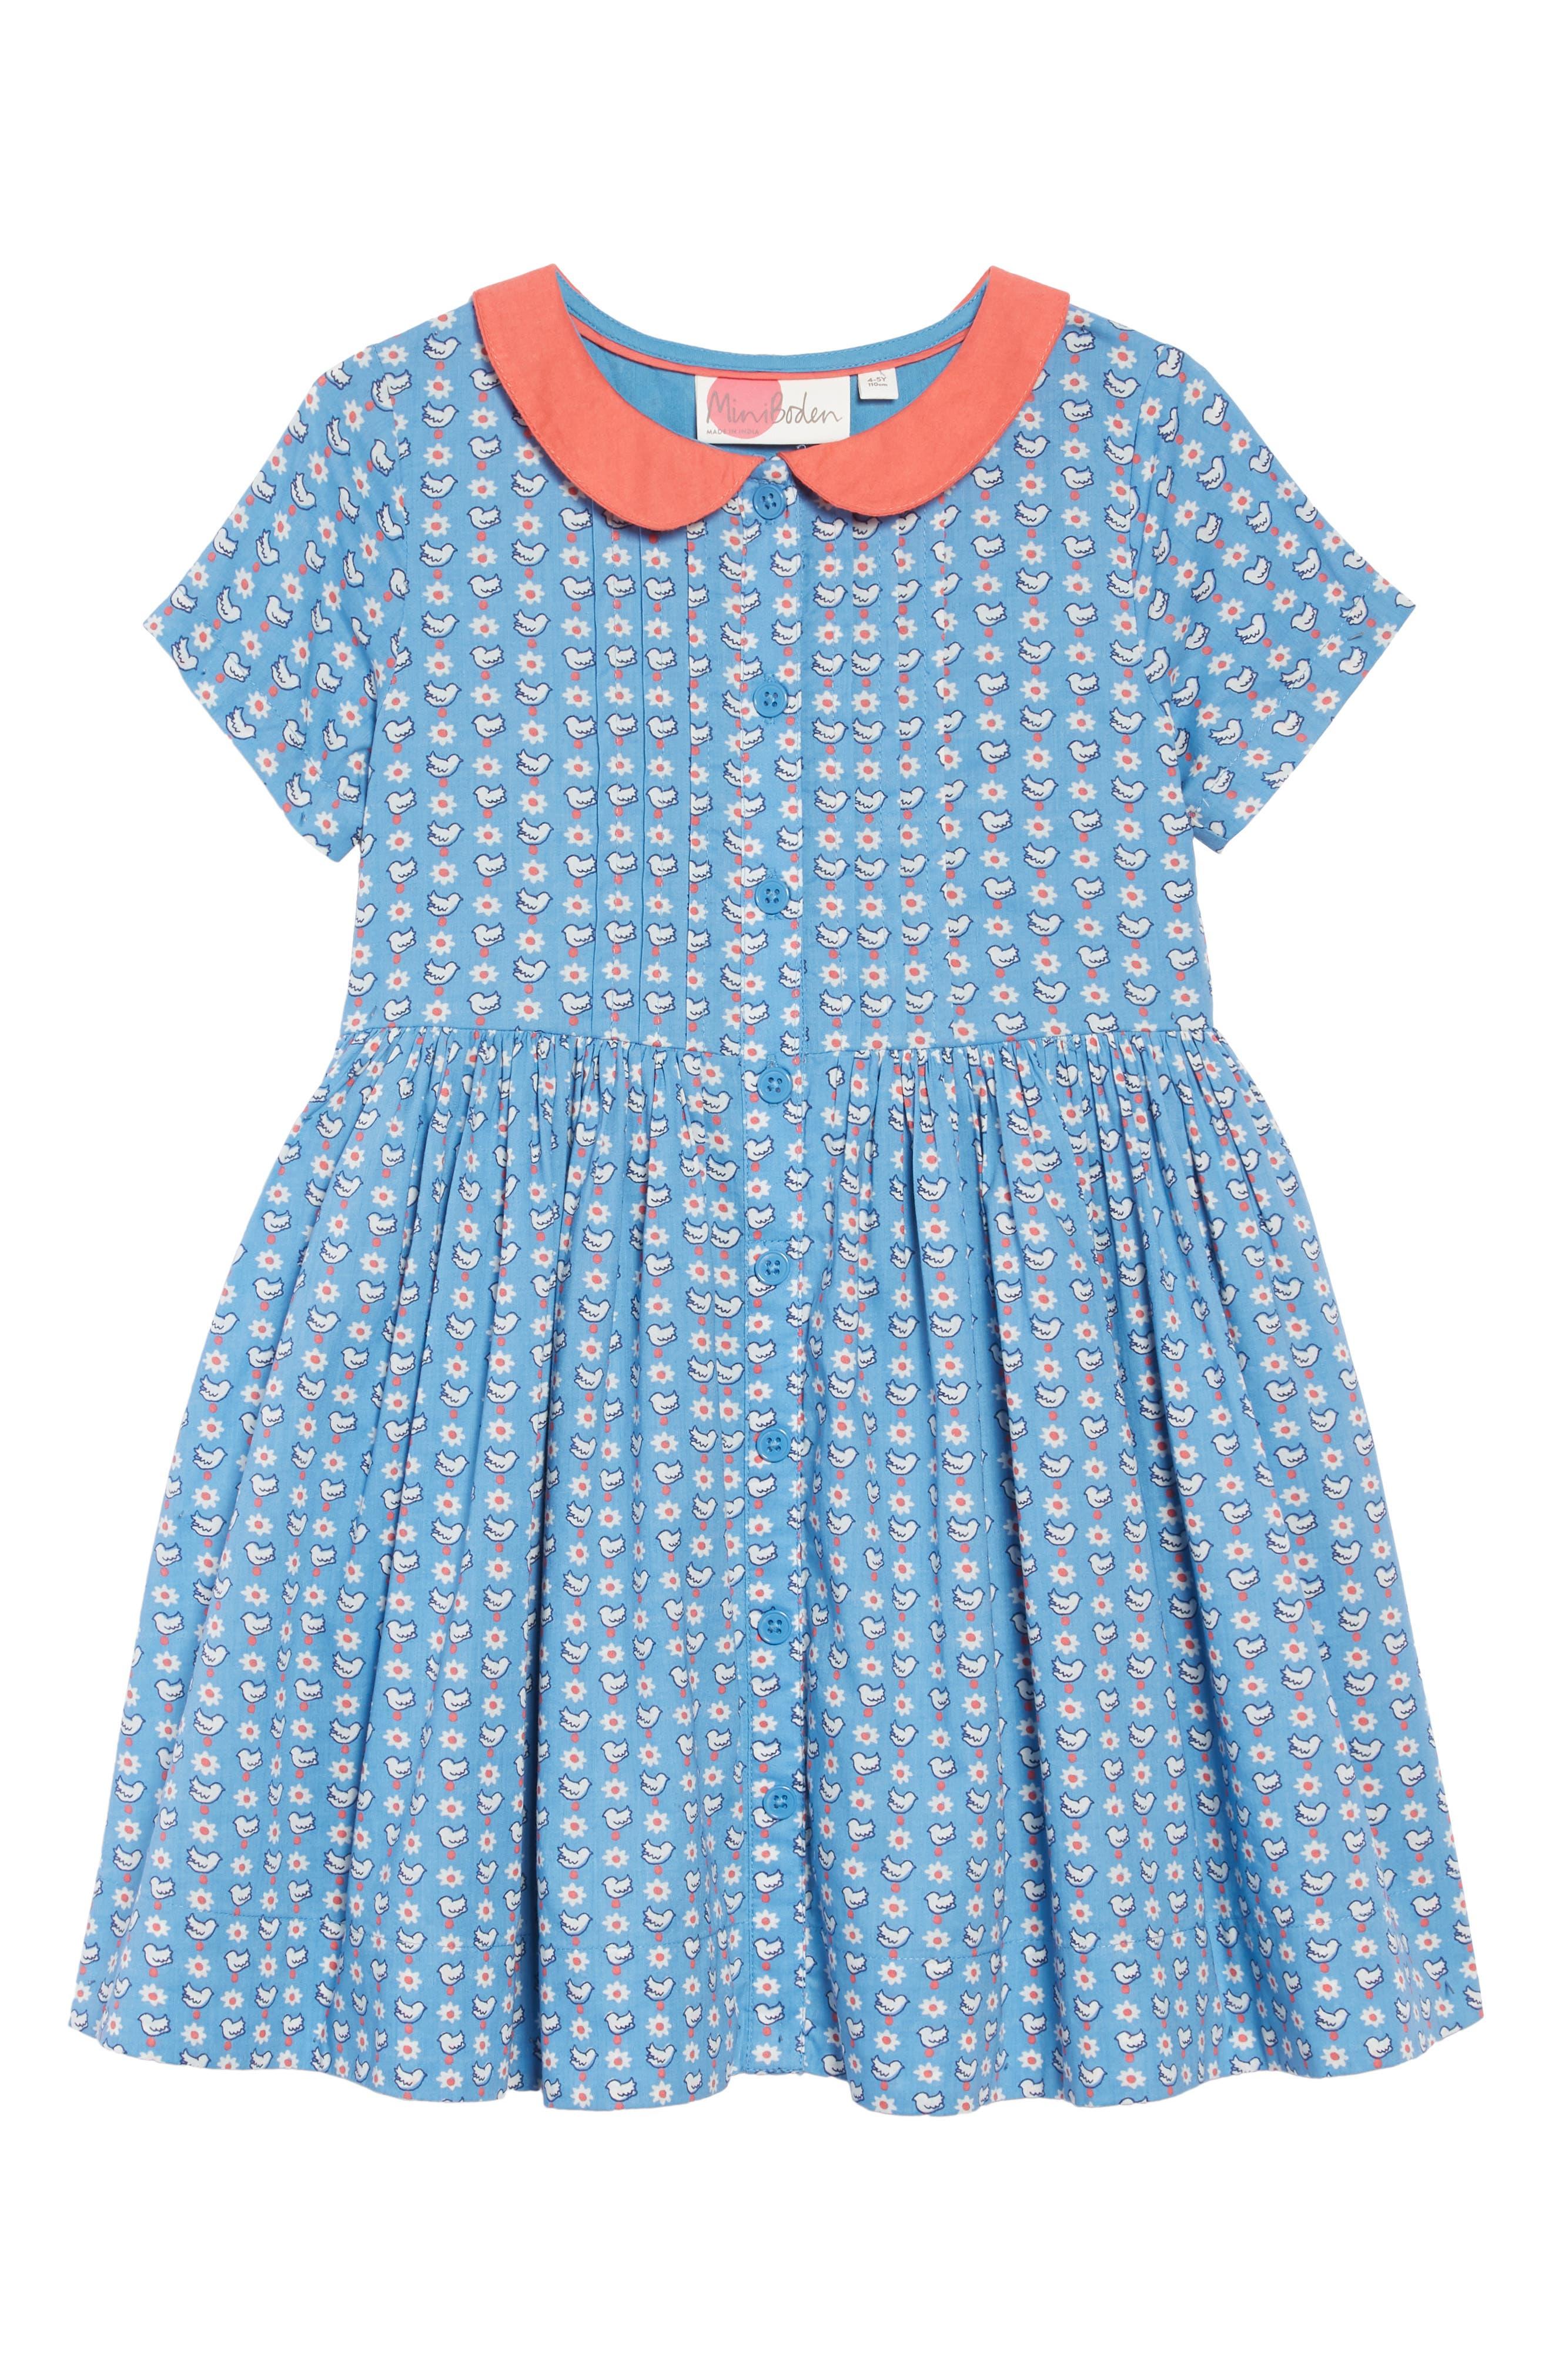 Nostalgic Collared Dress,                         Main,                         color, BLUE GEO BIRDS